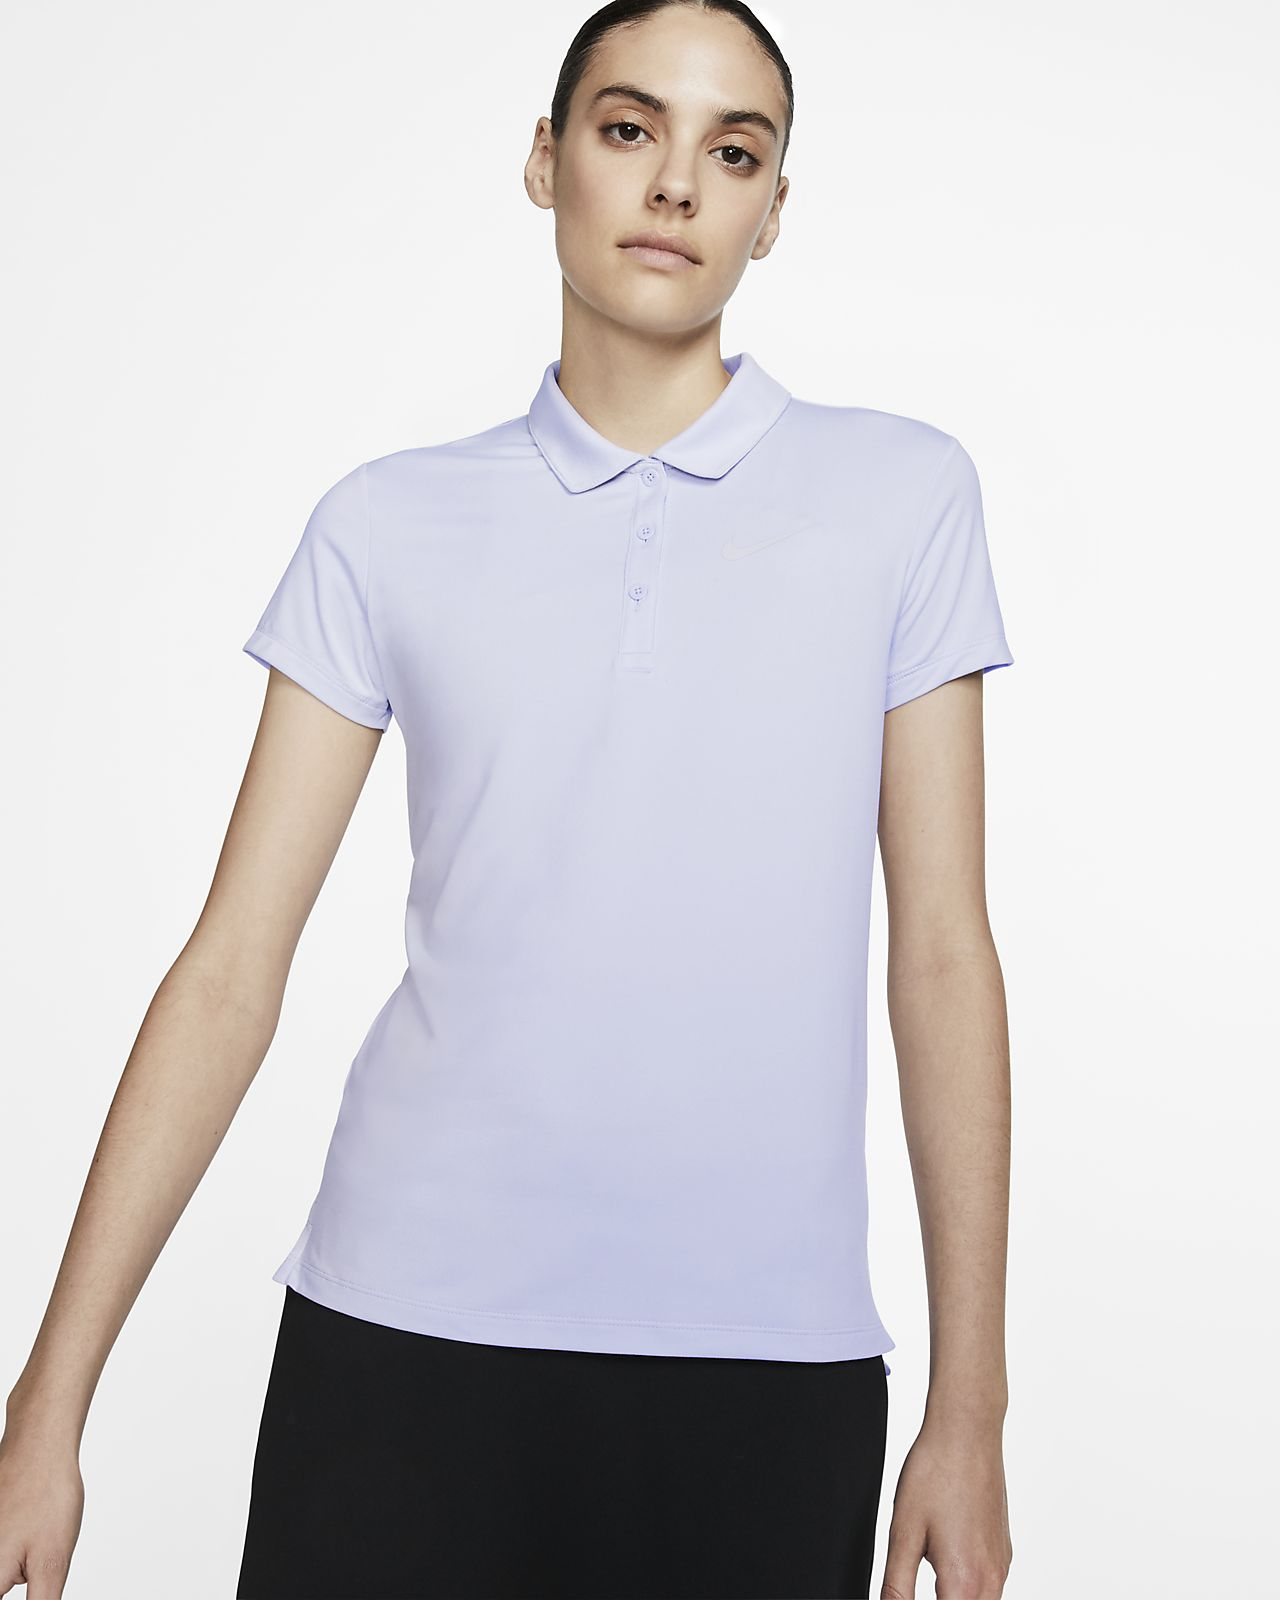 Damska koszulka polo do tenisa NikeCourt Pure